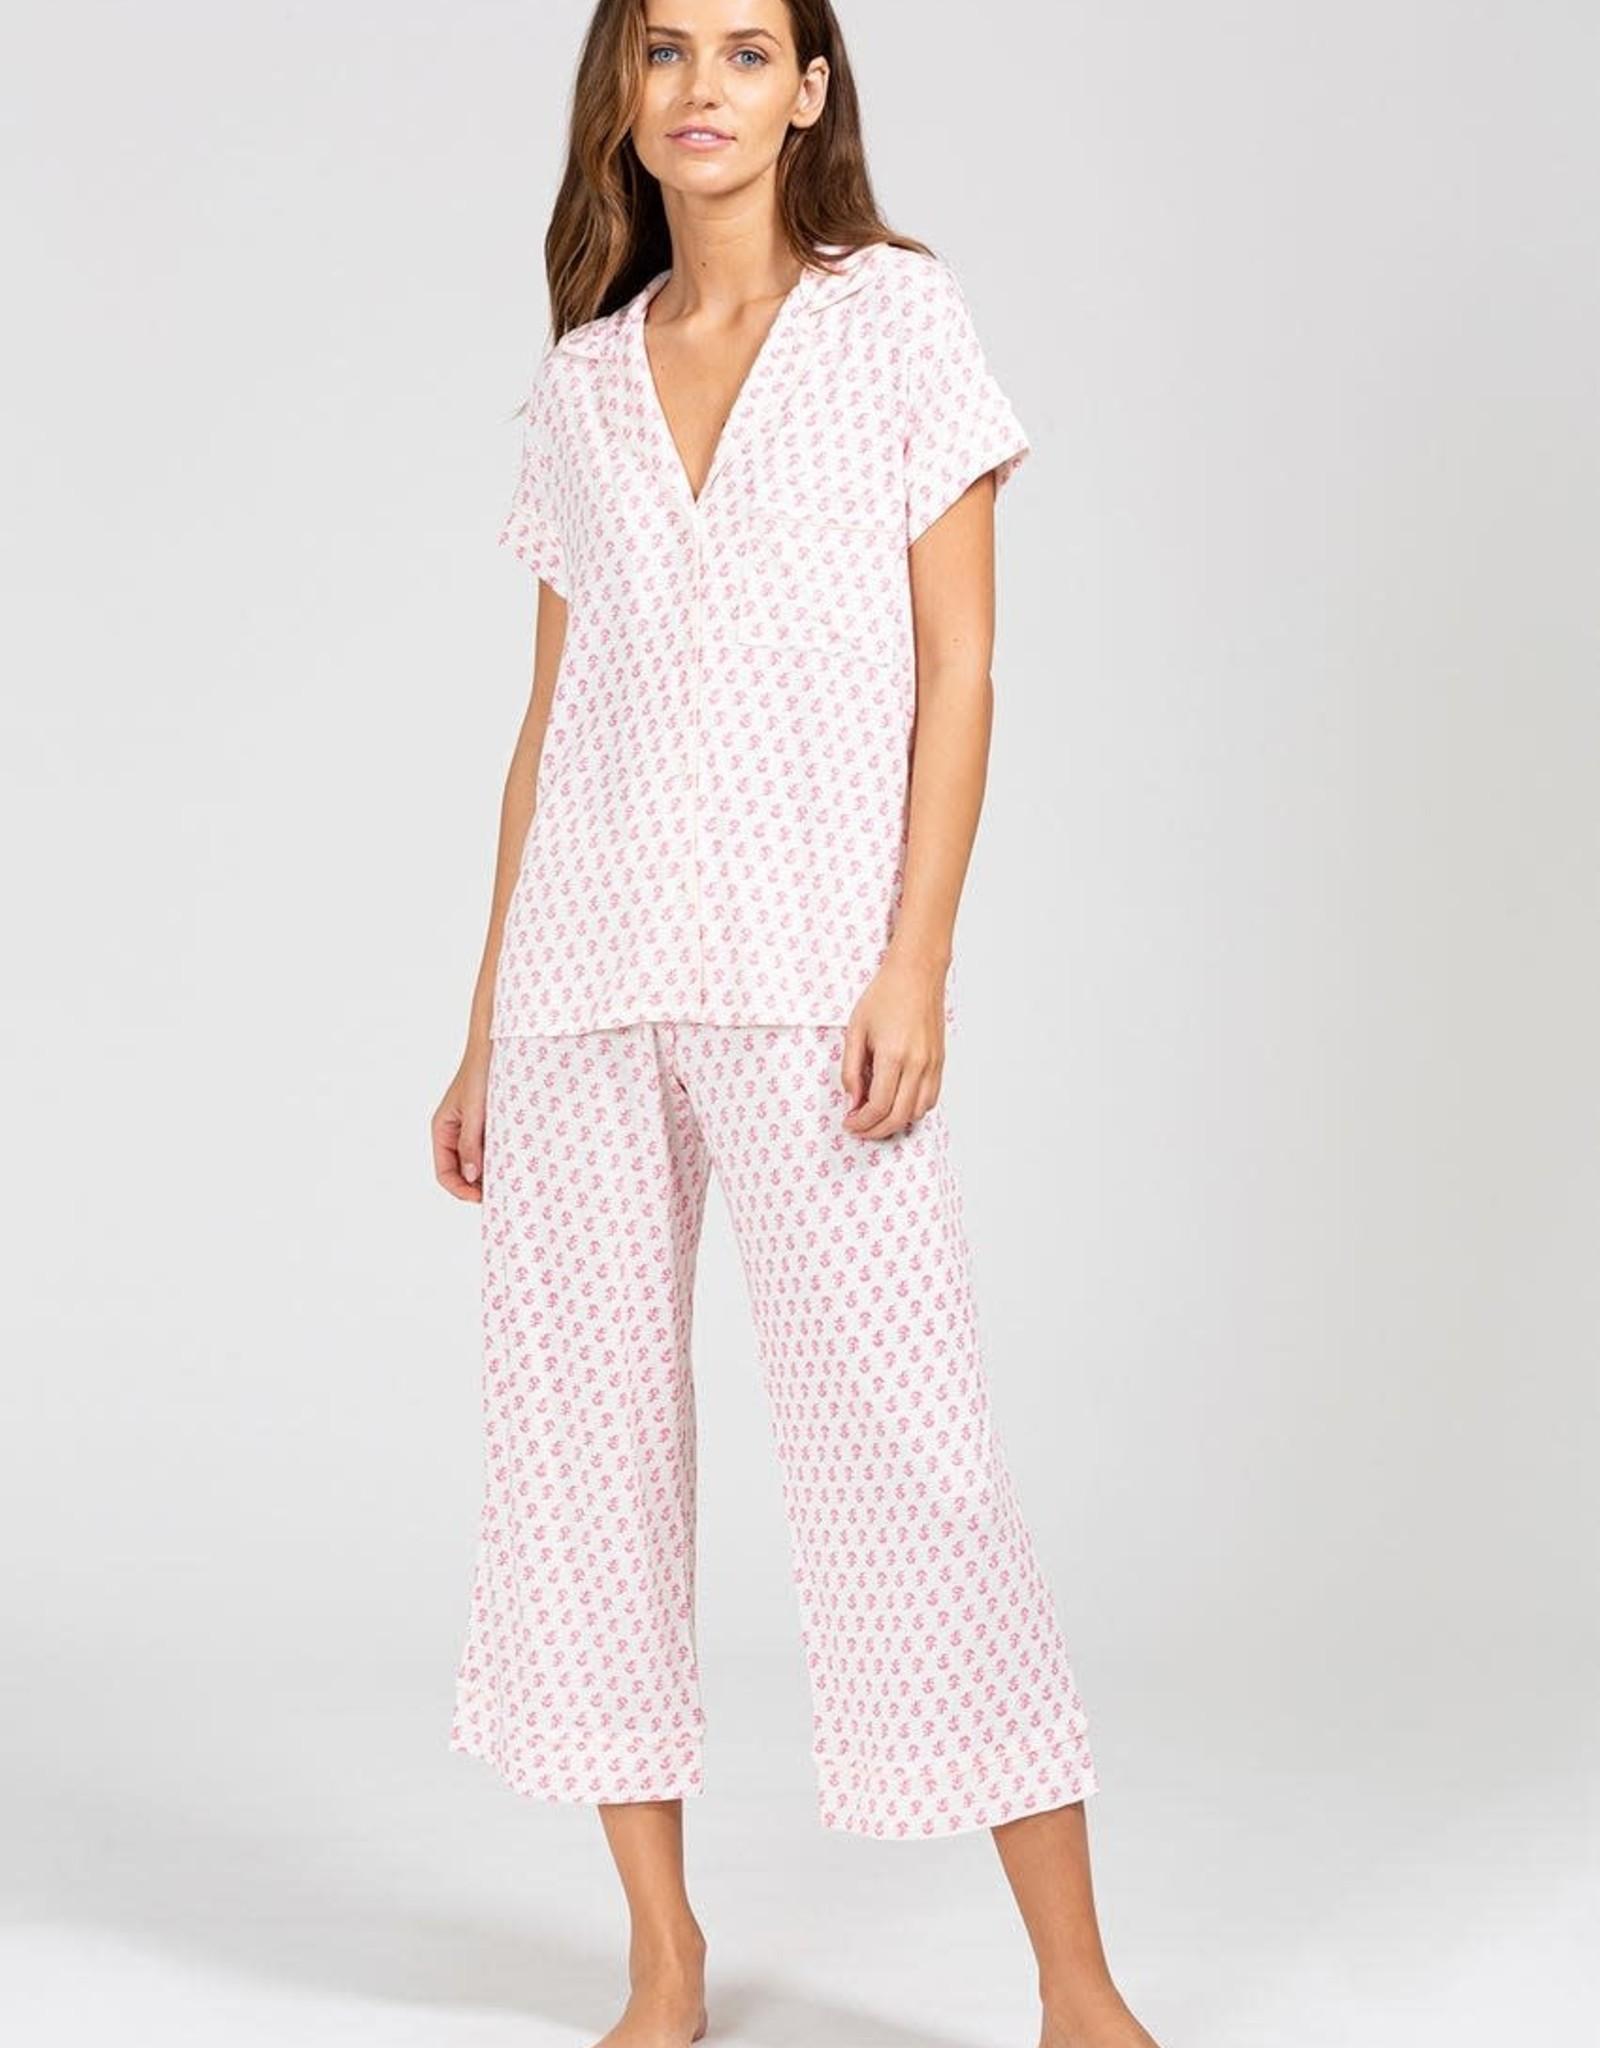 Eberjey Gisele Printed The Short Sleeve Cropped PJ Set Daisy Bright Pink